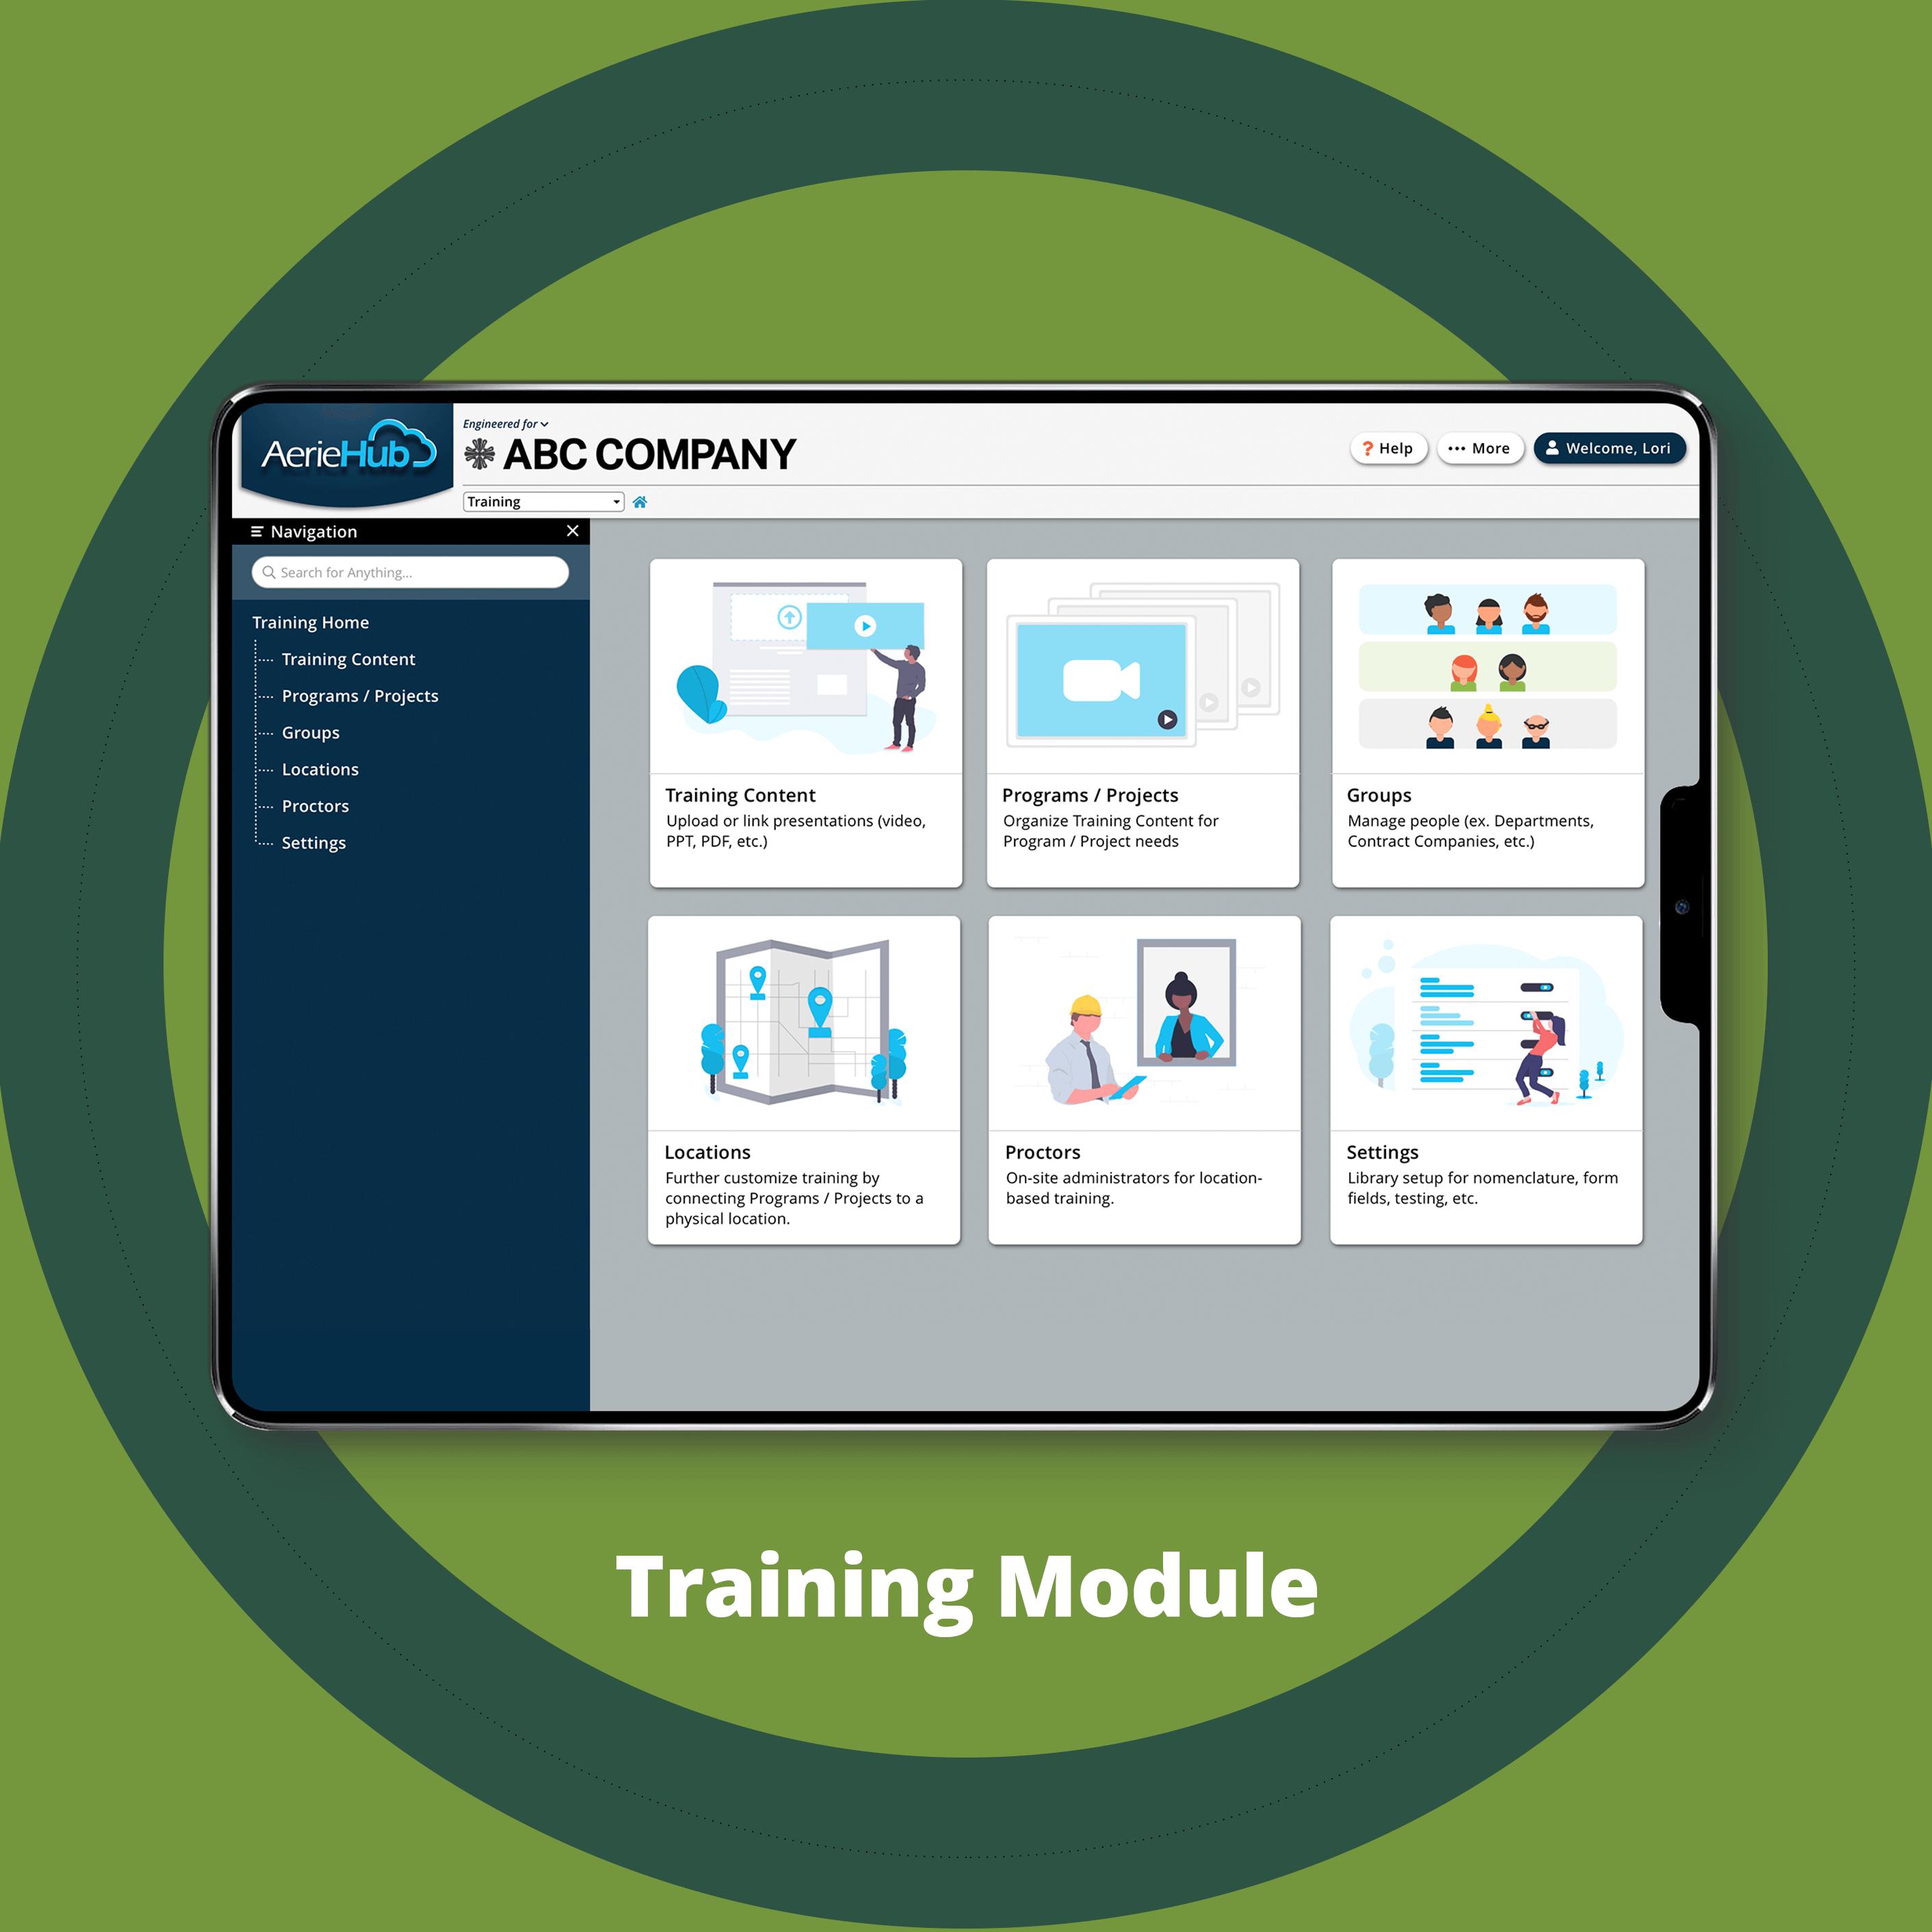 Training Module